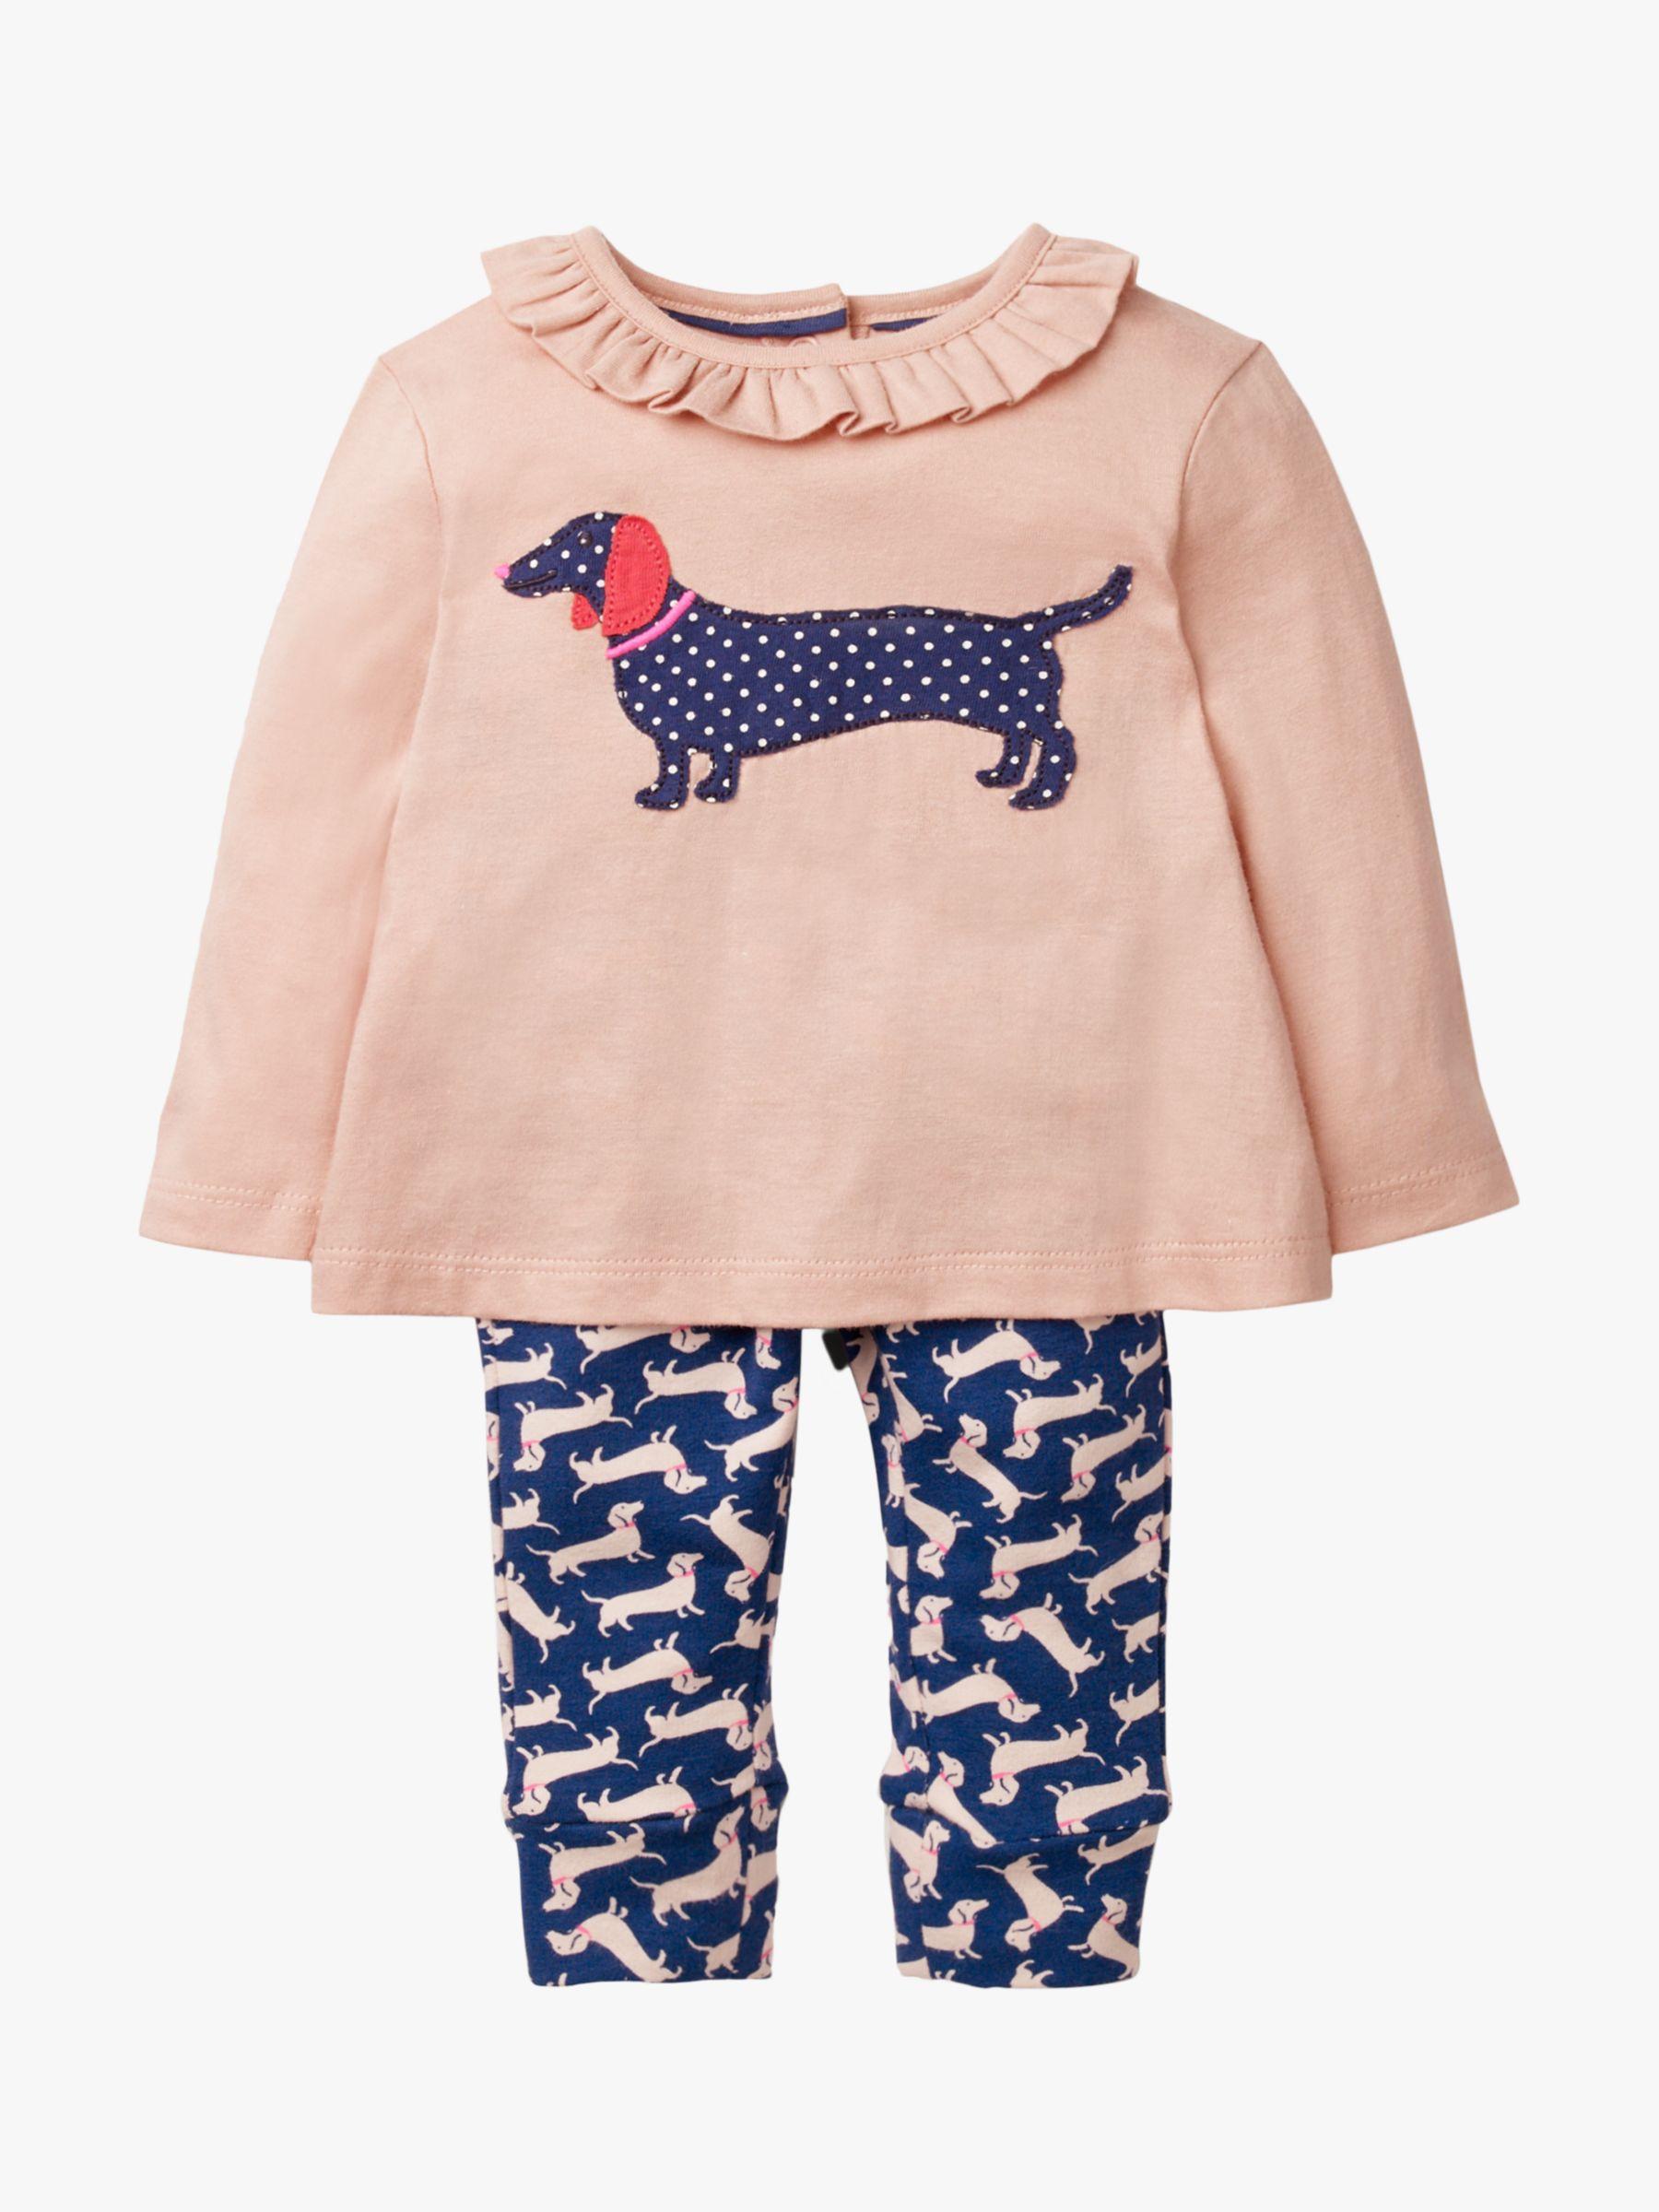 NEW EX BABY MINI BODEN DUCKS  DOG APPLIQUE JERSEY TOP LEGGING PLAY SET